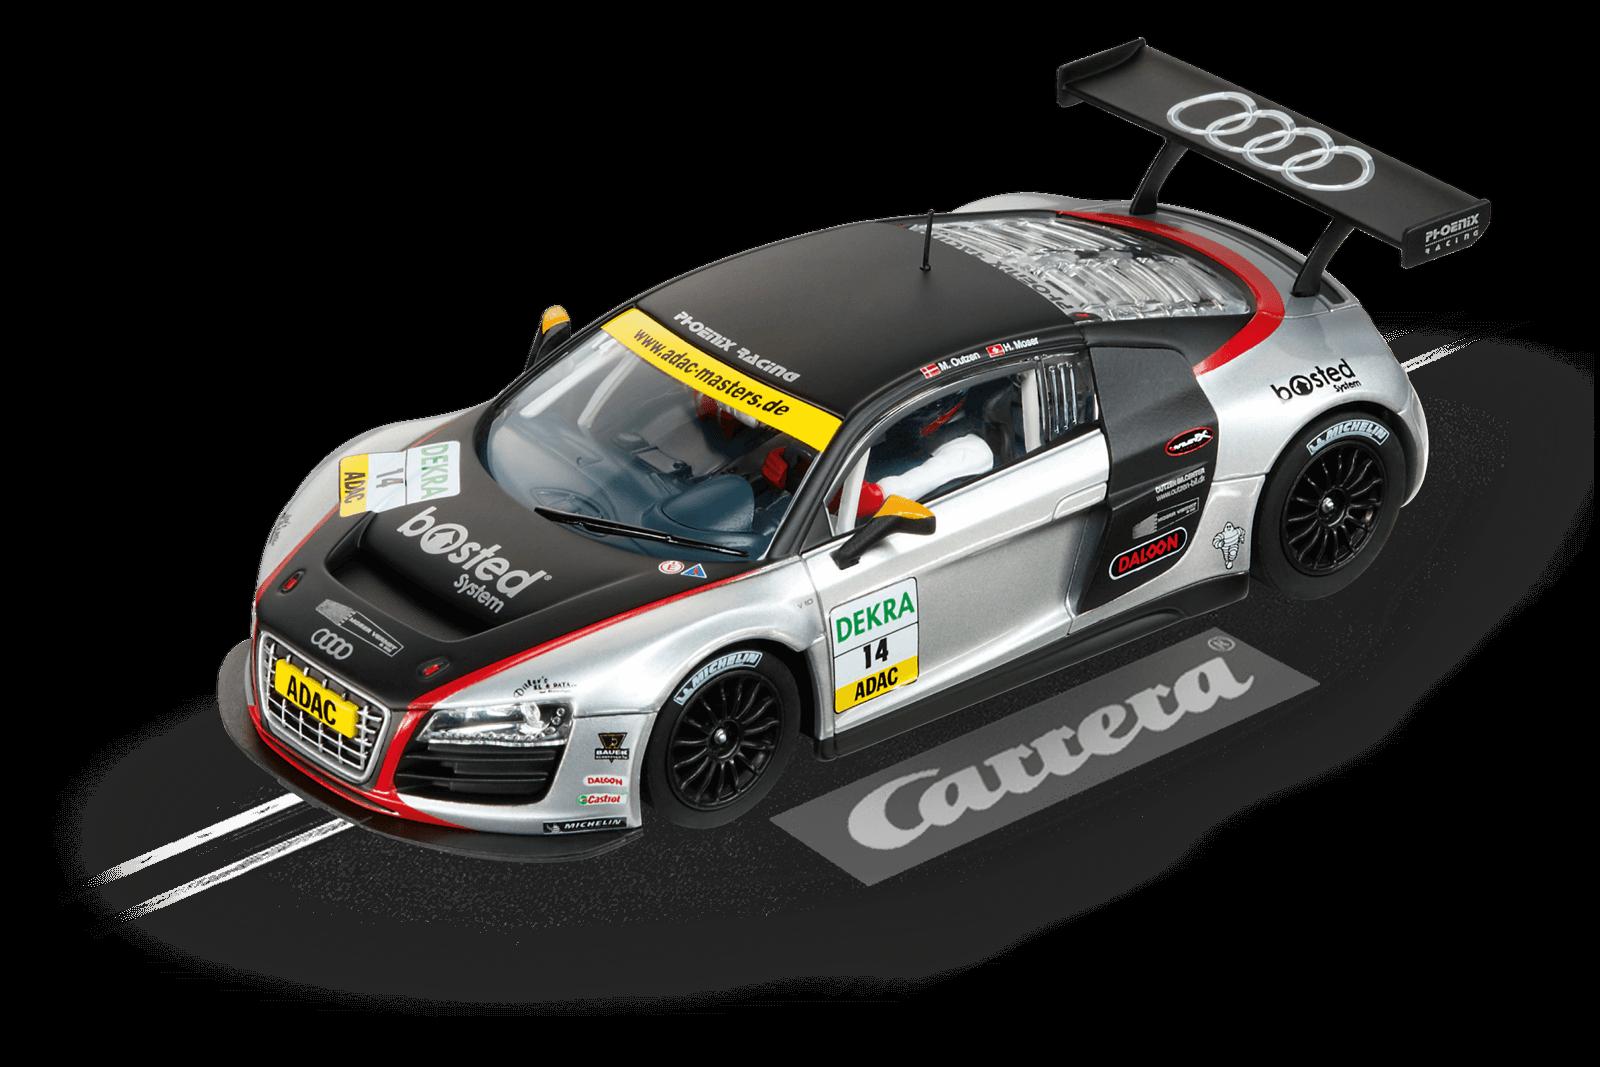 TOP Tuning Carrera Digital 132 - Audi R8 LMS - Phoenix Racing No.14  wie 30570